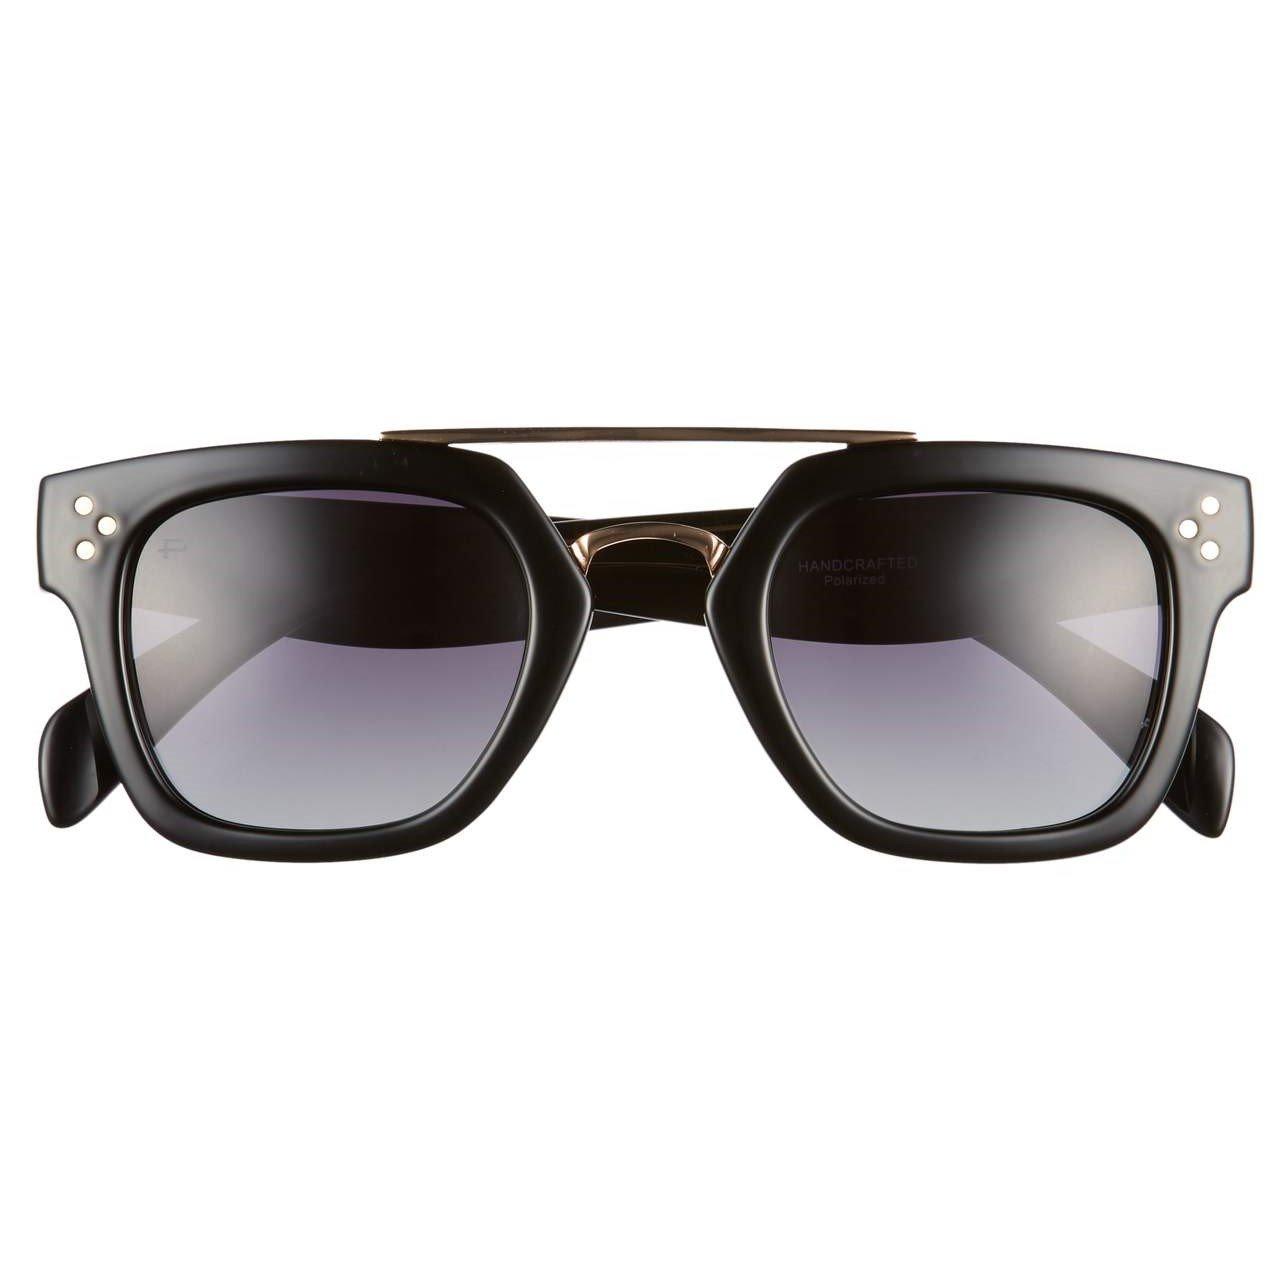 "dcd71ab4c5 Amazon.com  PRIVÉ REVAUX ICON Collection ""The Foxx"" Designer Polarized  Geometric Sunglasses  Clothing"